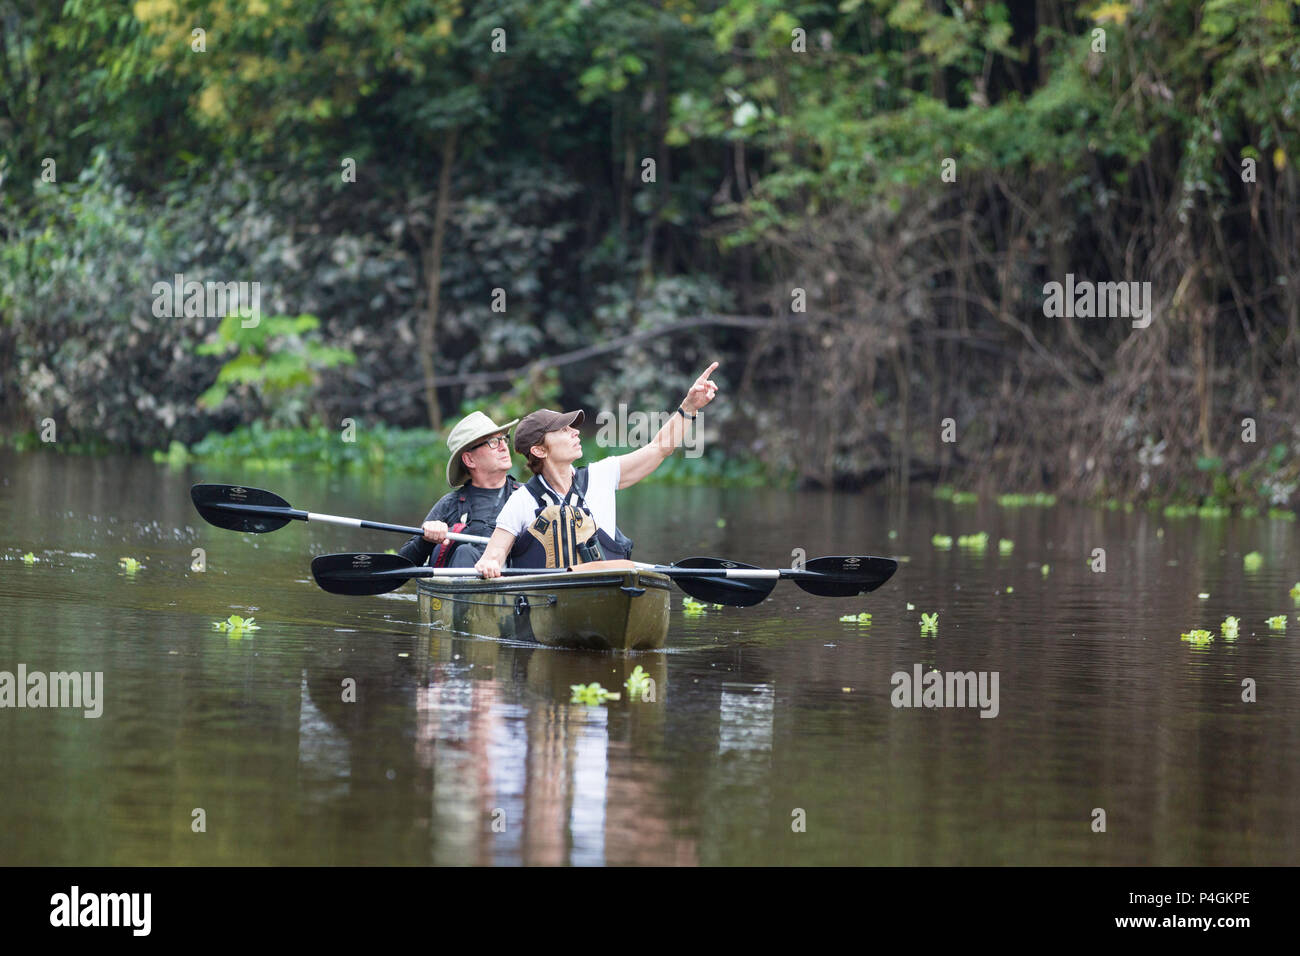 Lindblad Expeditions guests kayaking in Amazon National Park, Loreto, Peru - Stock Image